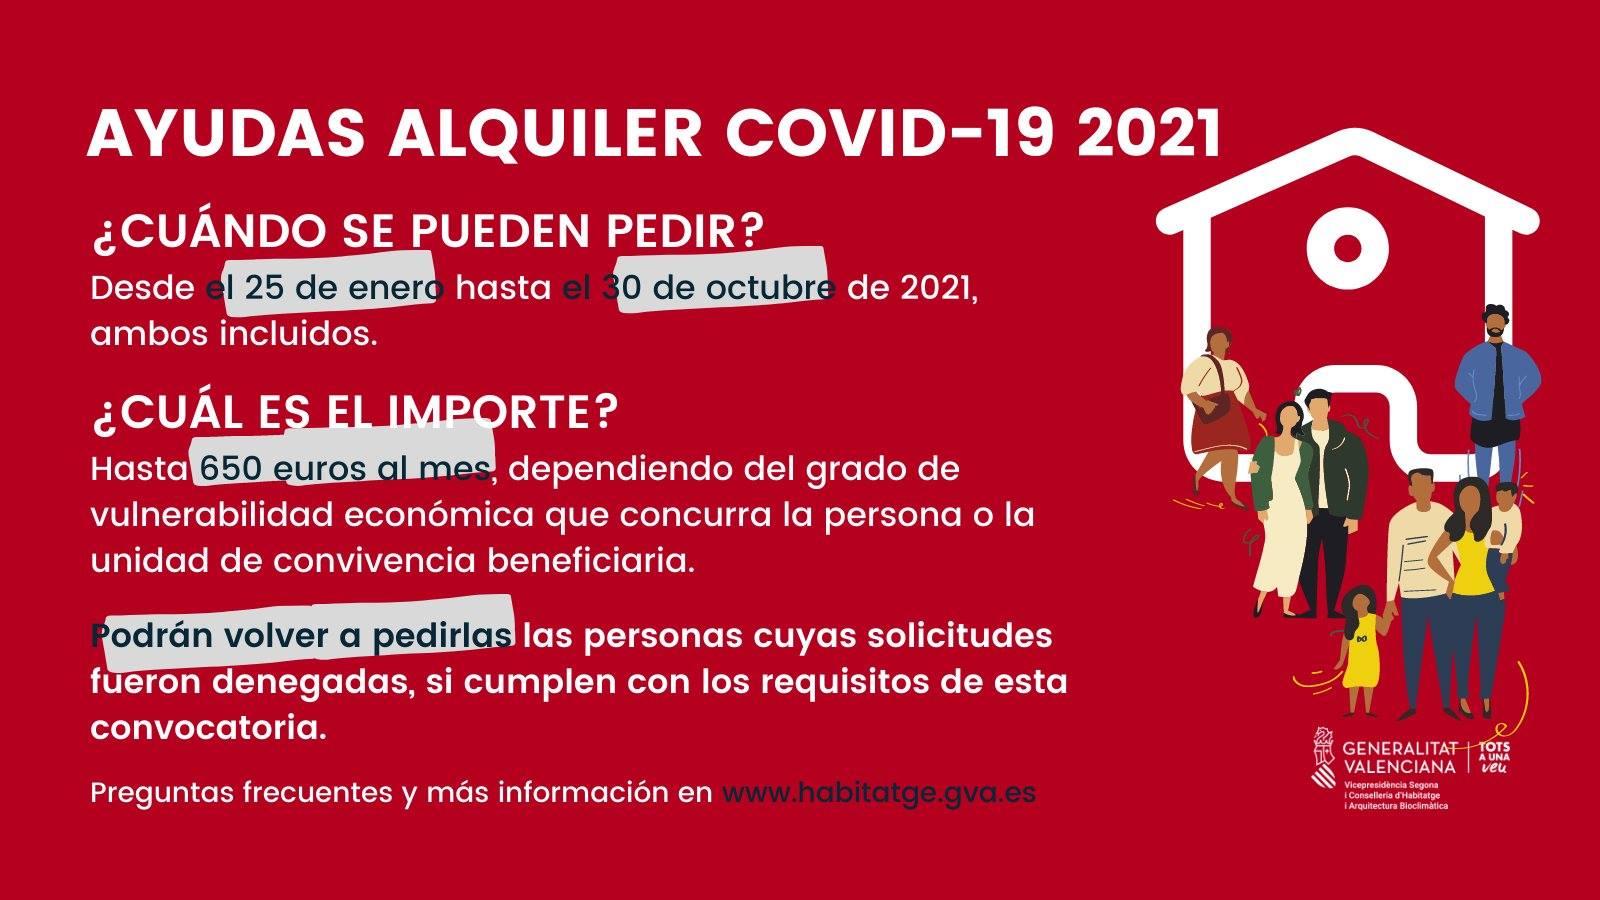 Ayudas alquiler Covid-19 2021 Sanchis asesores